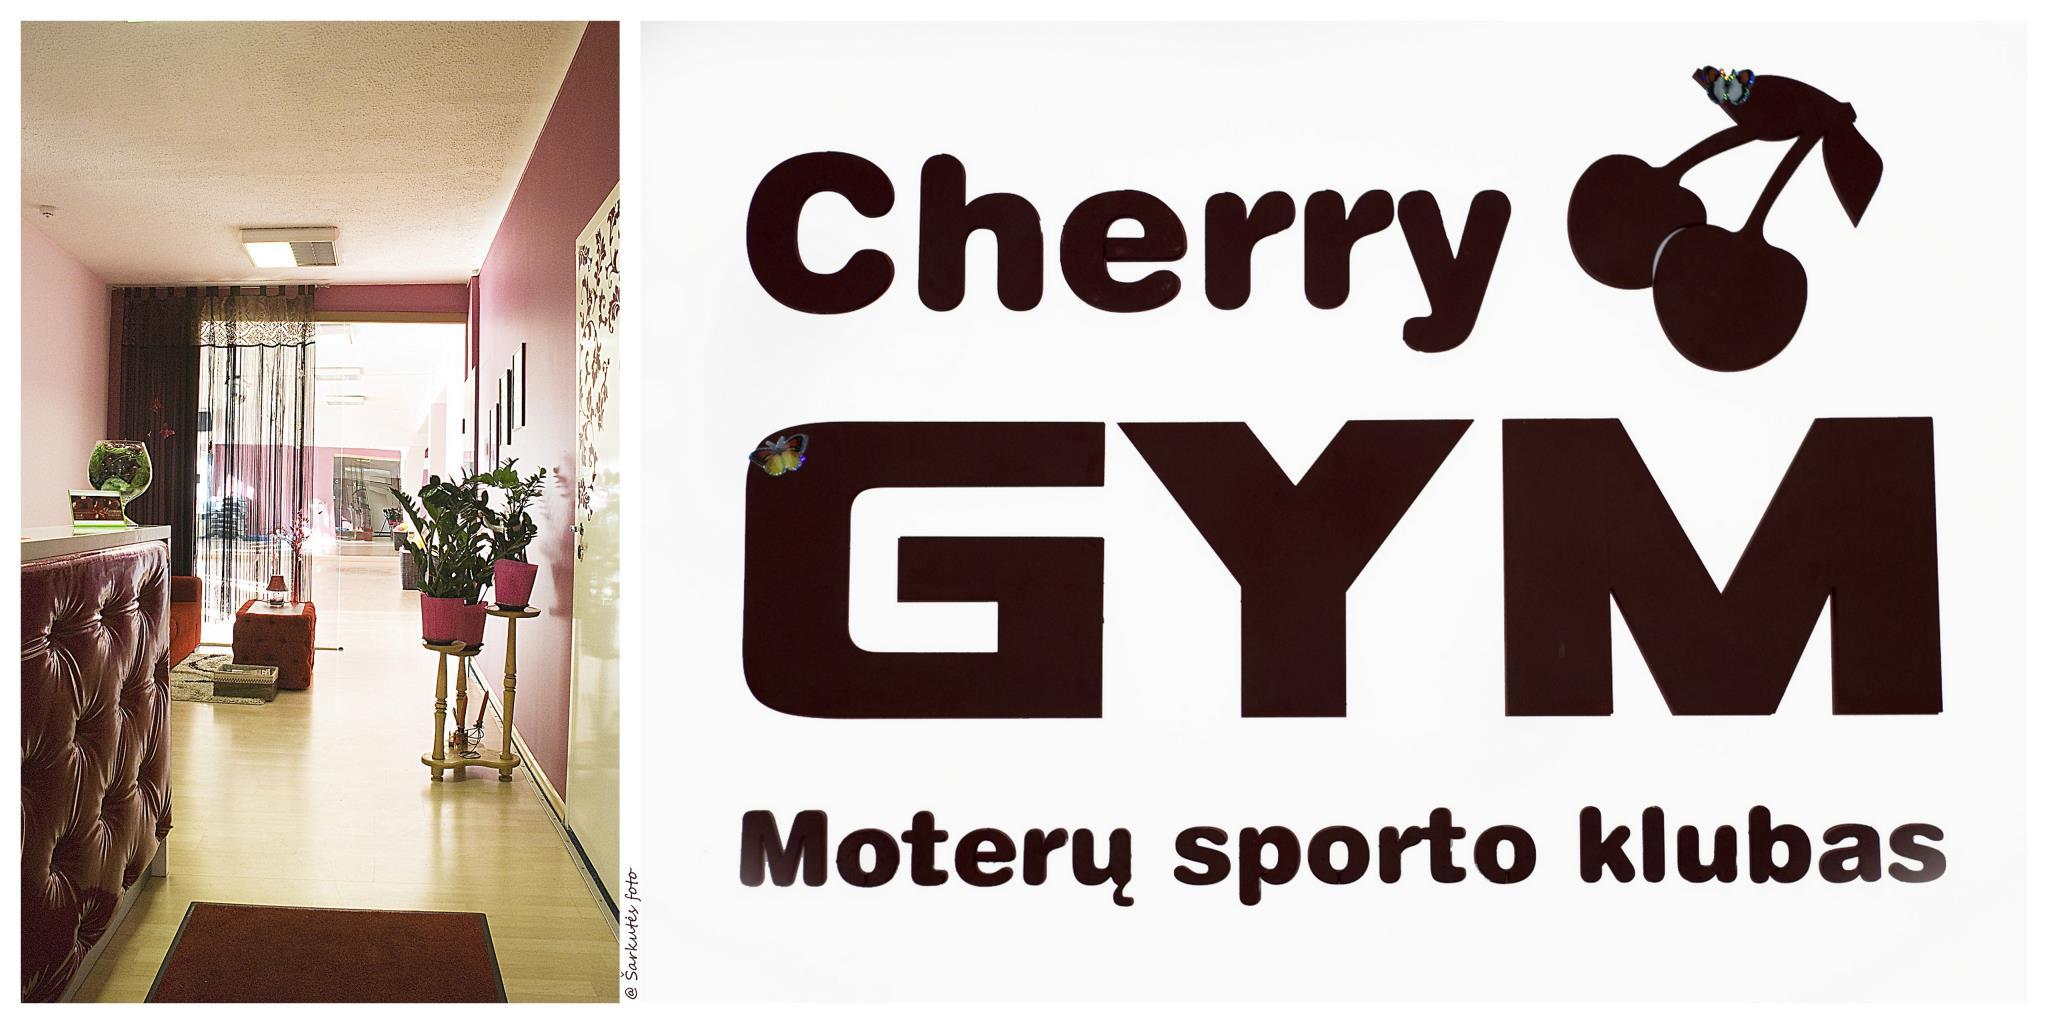 Cherry gym_